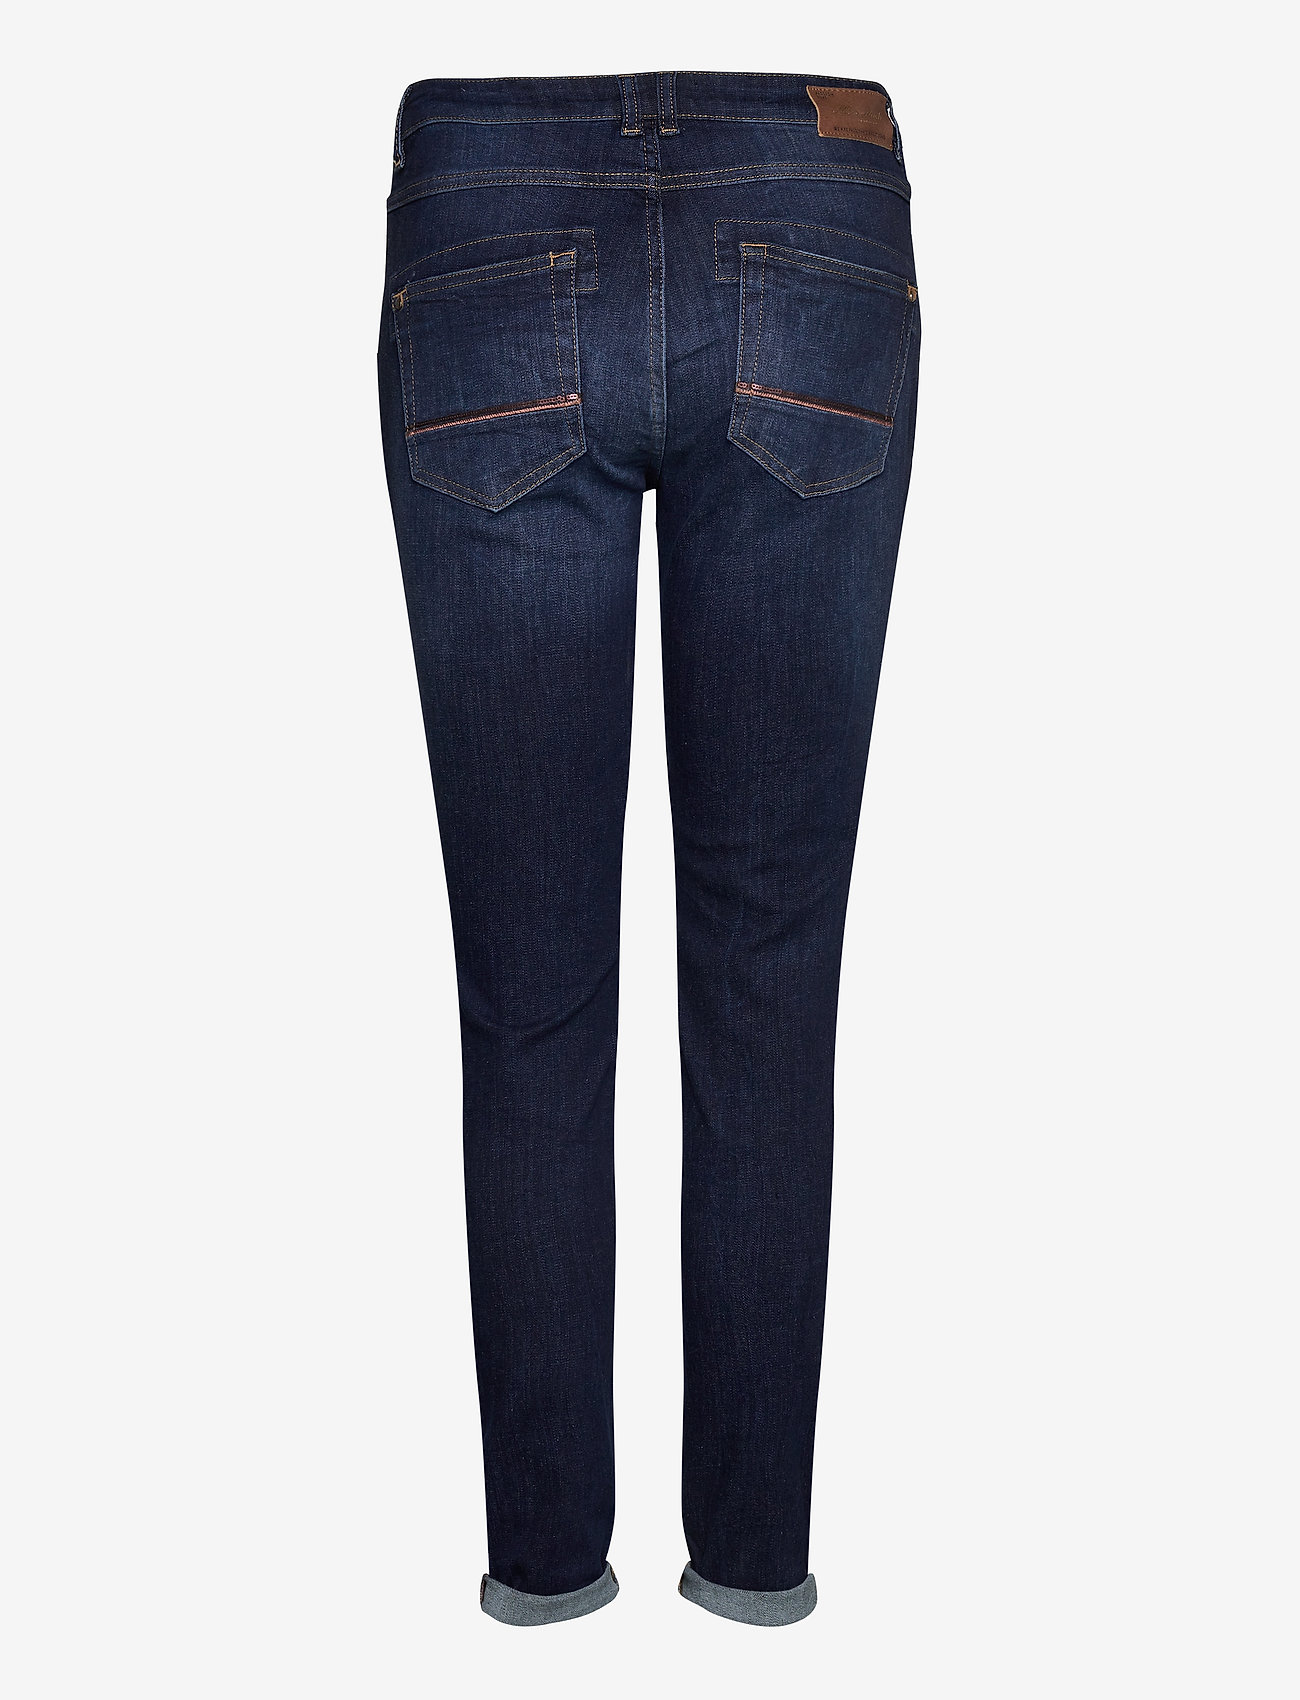 Naomi Jewel Jeans (Blue) - MOS MOSH AuxT12